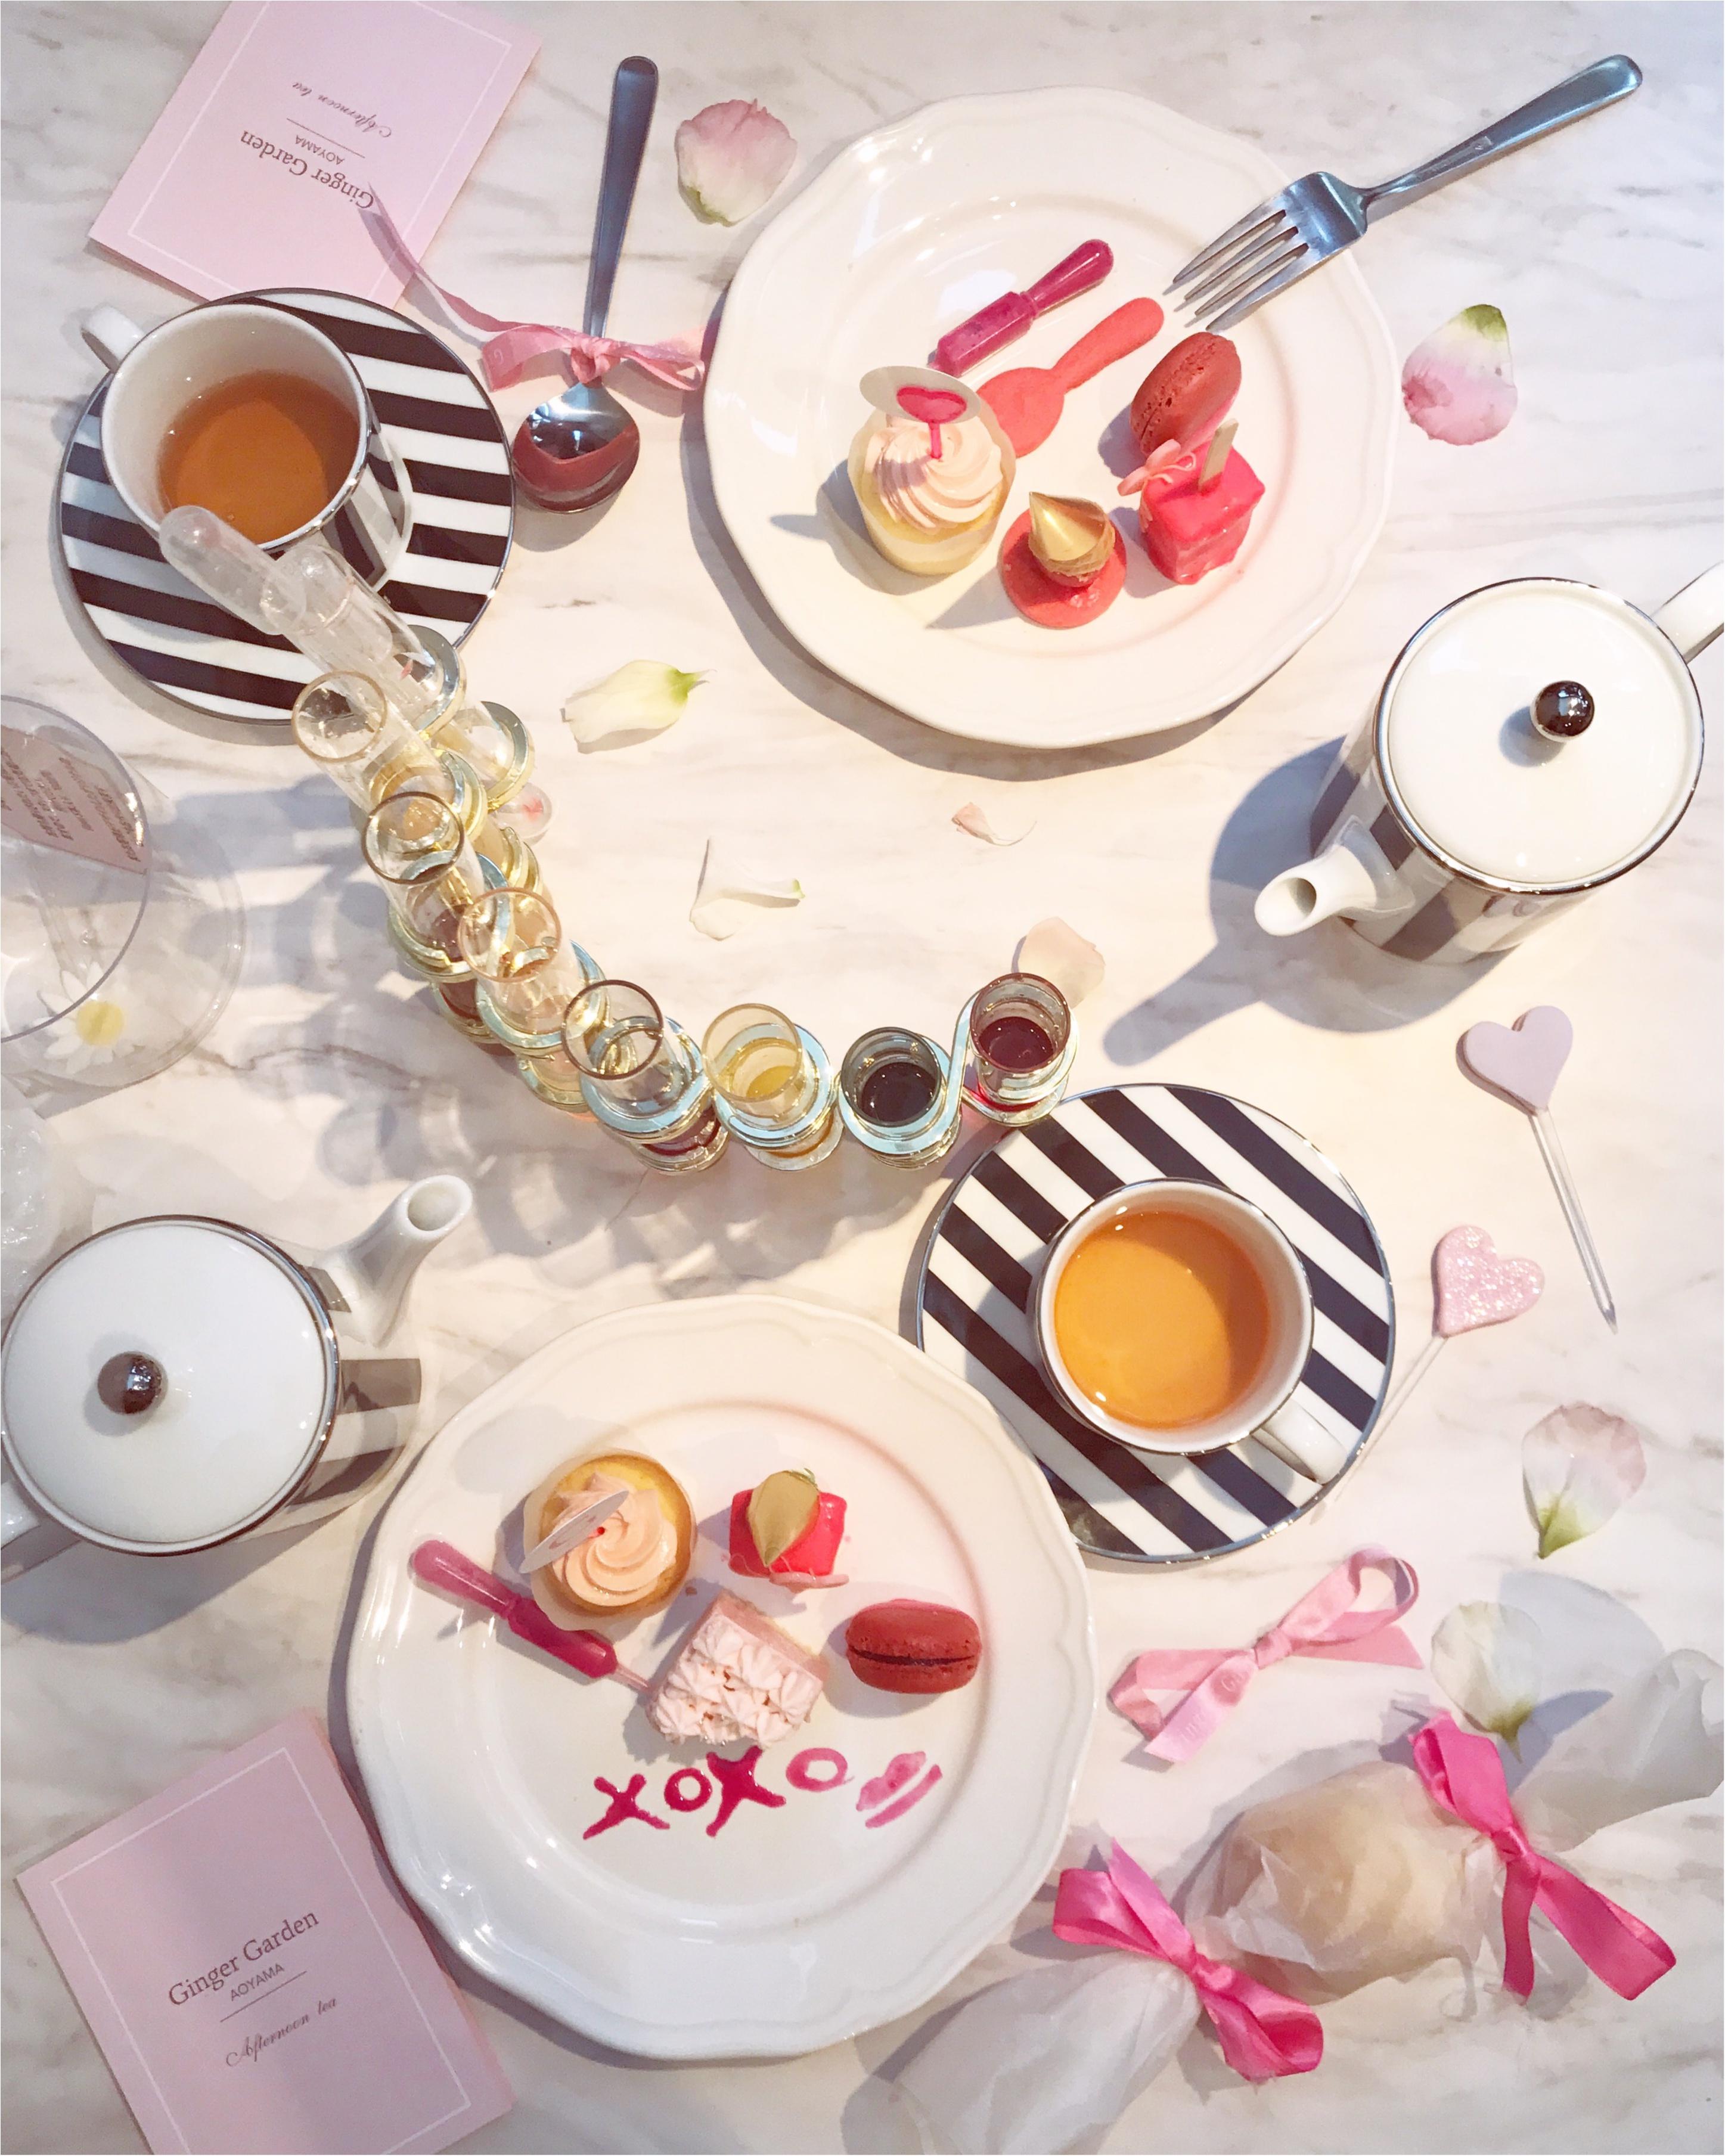 【FOOD】今1番可愛い#アフタヌーンティー はここ♡女子会にぴったり⋈ #GingergardenAOYAMA_10